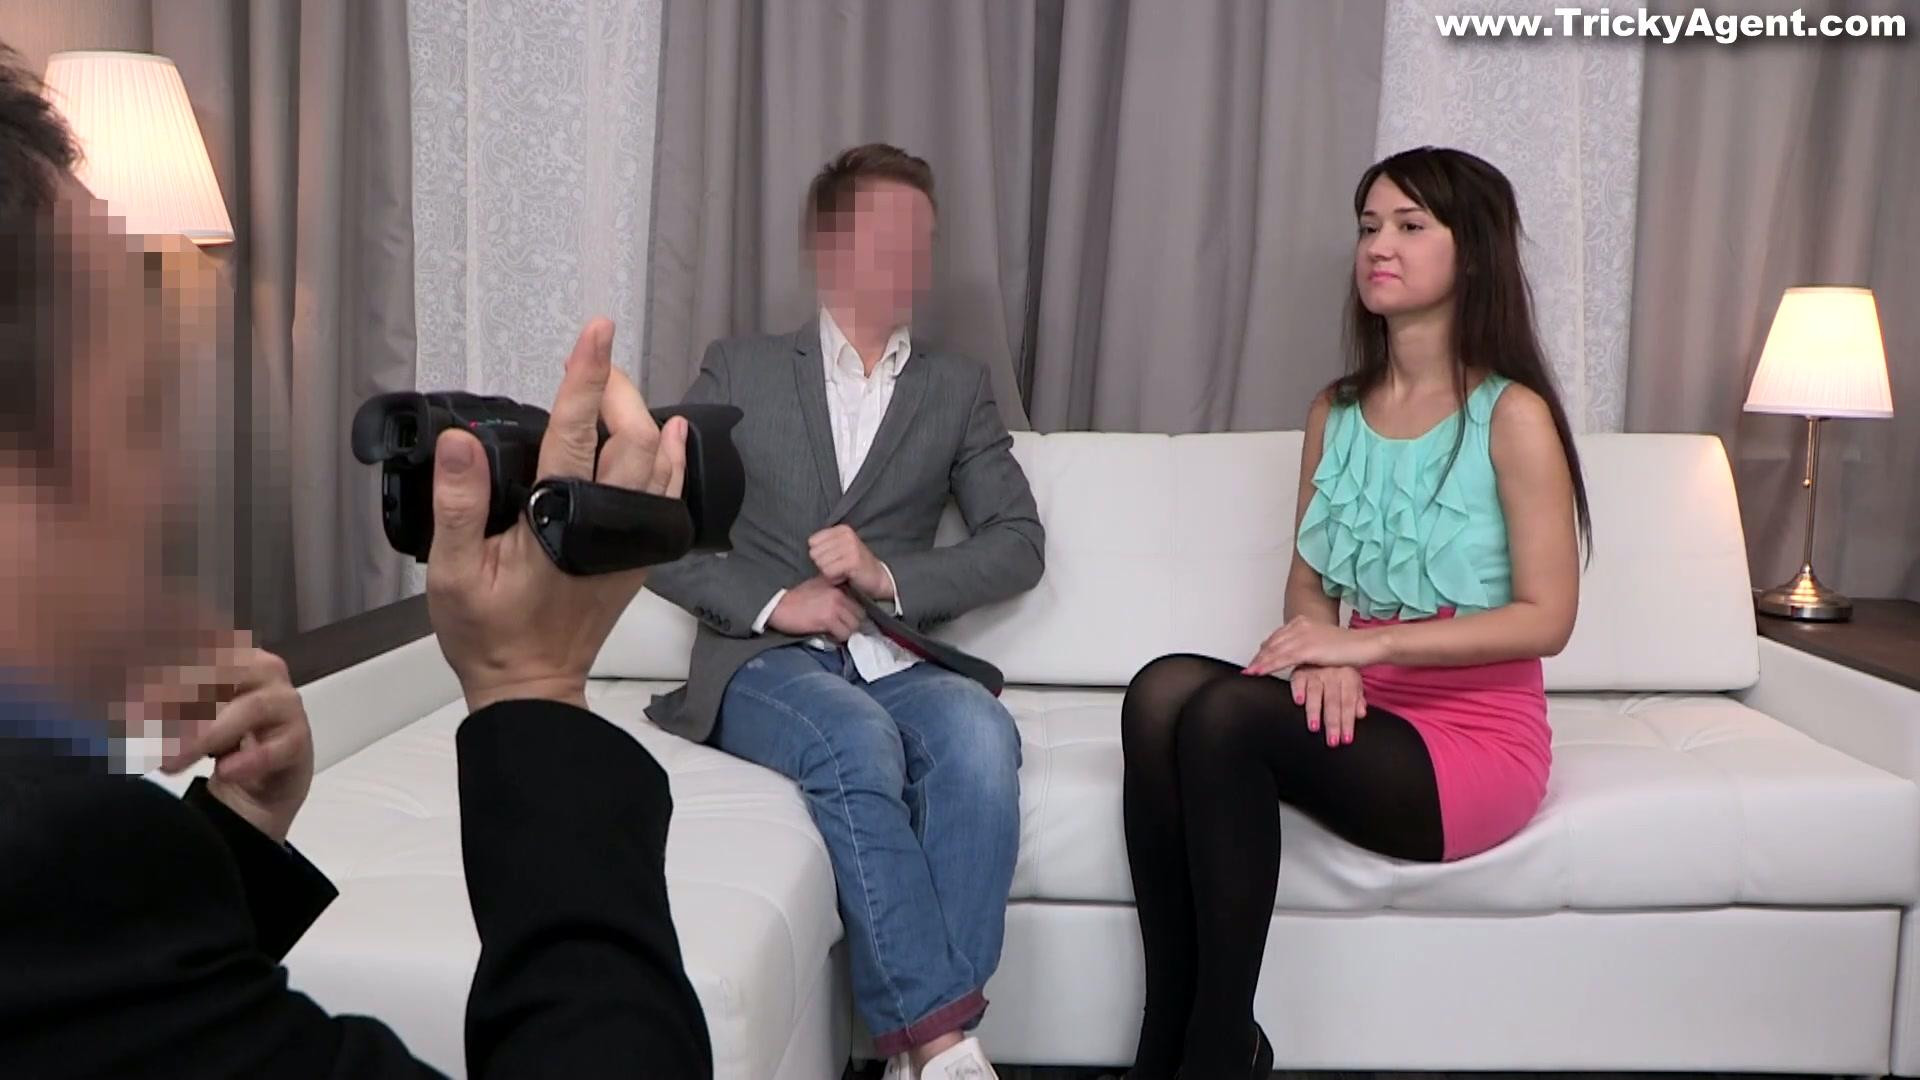 gaelle porno garcia diaz